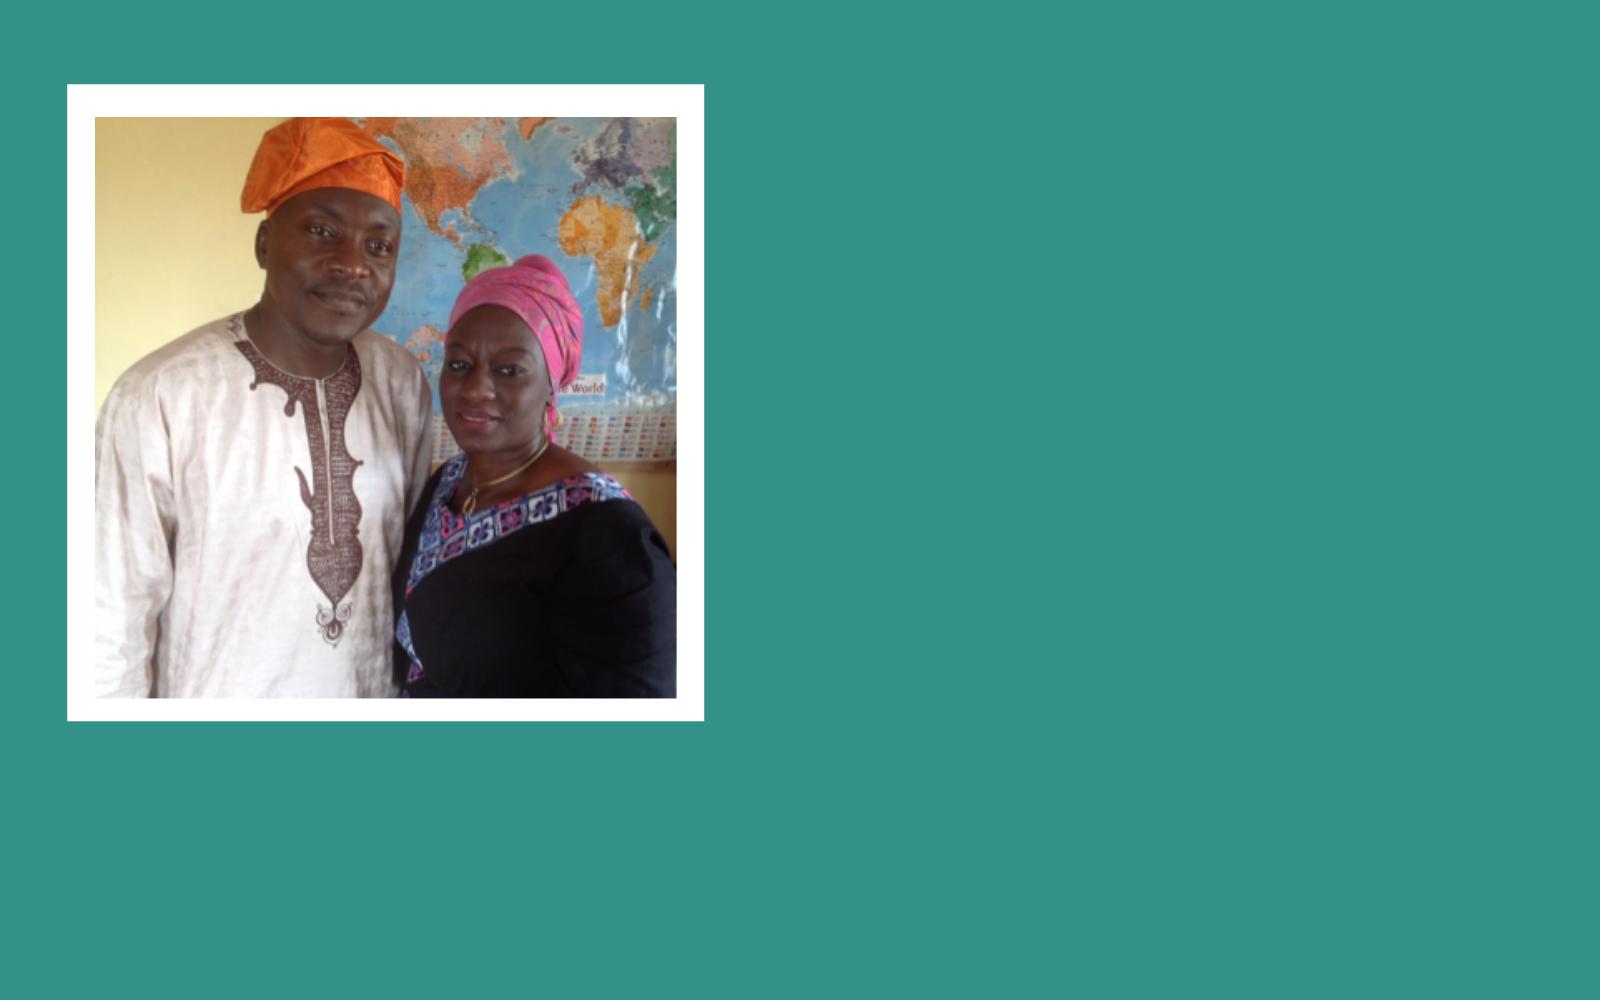 Support Martin and Shade Atanda's work to bring help and hope. image